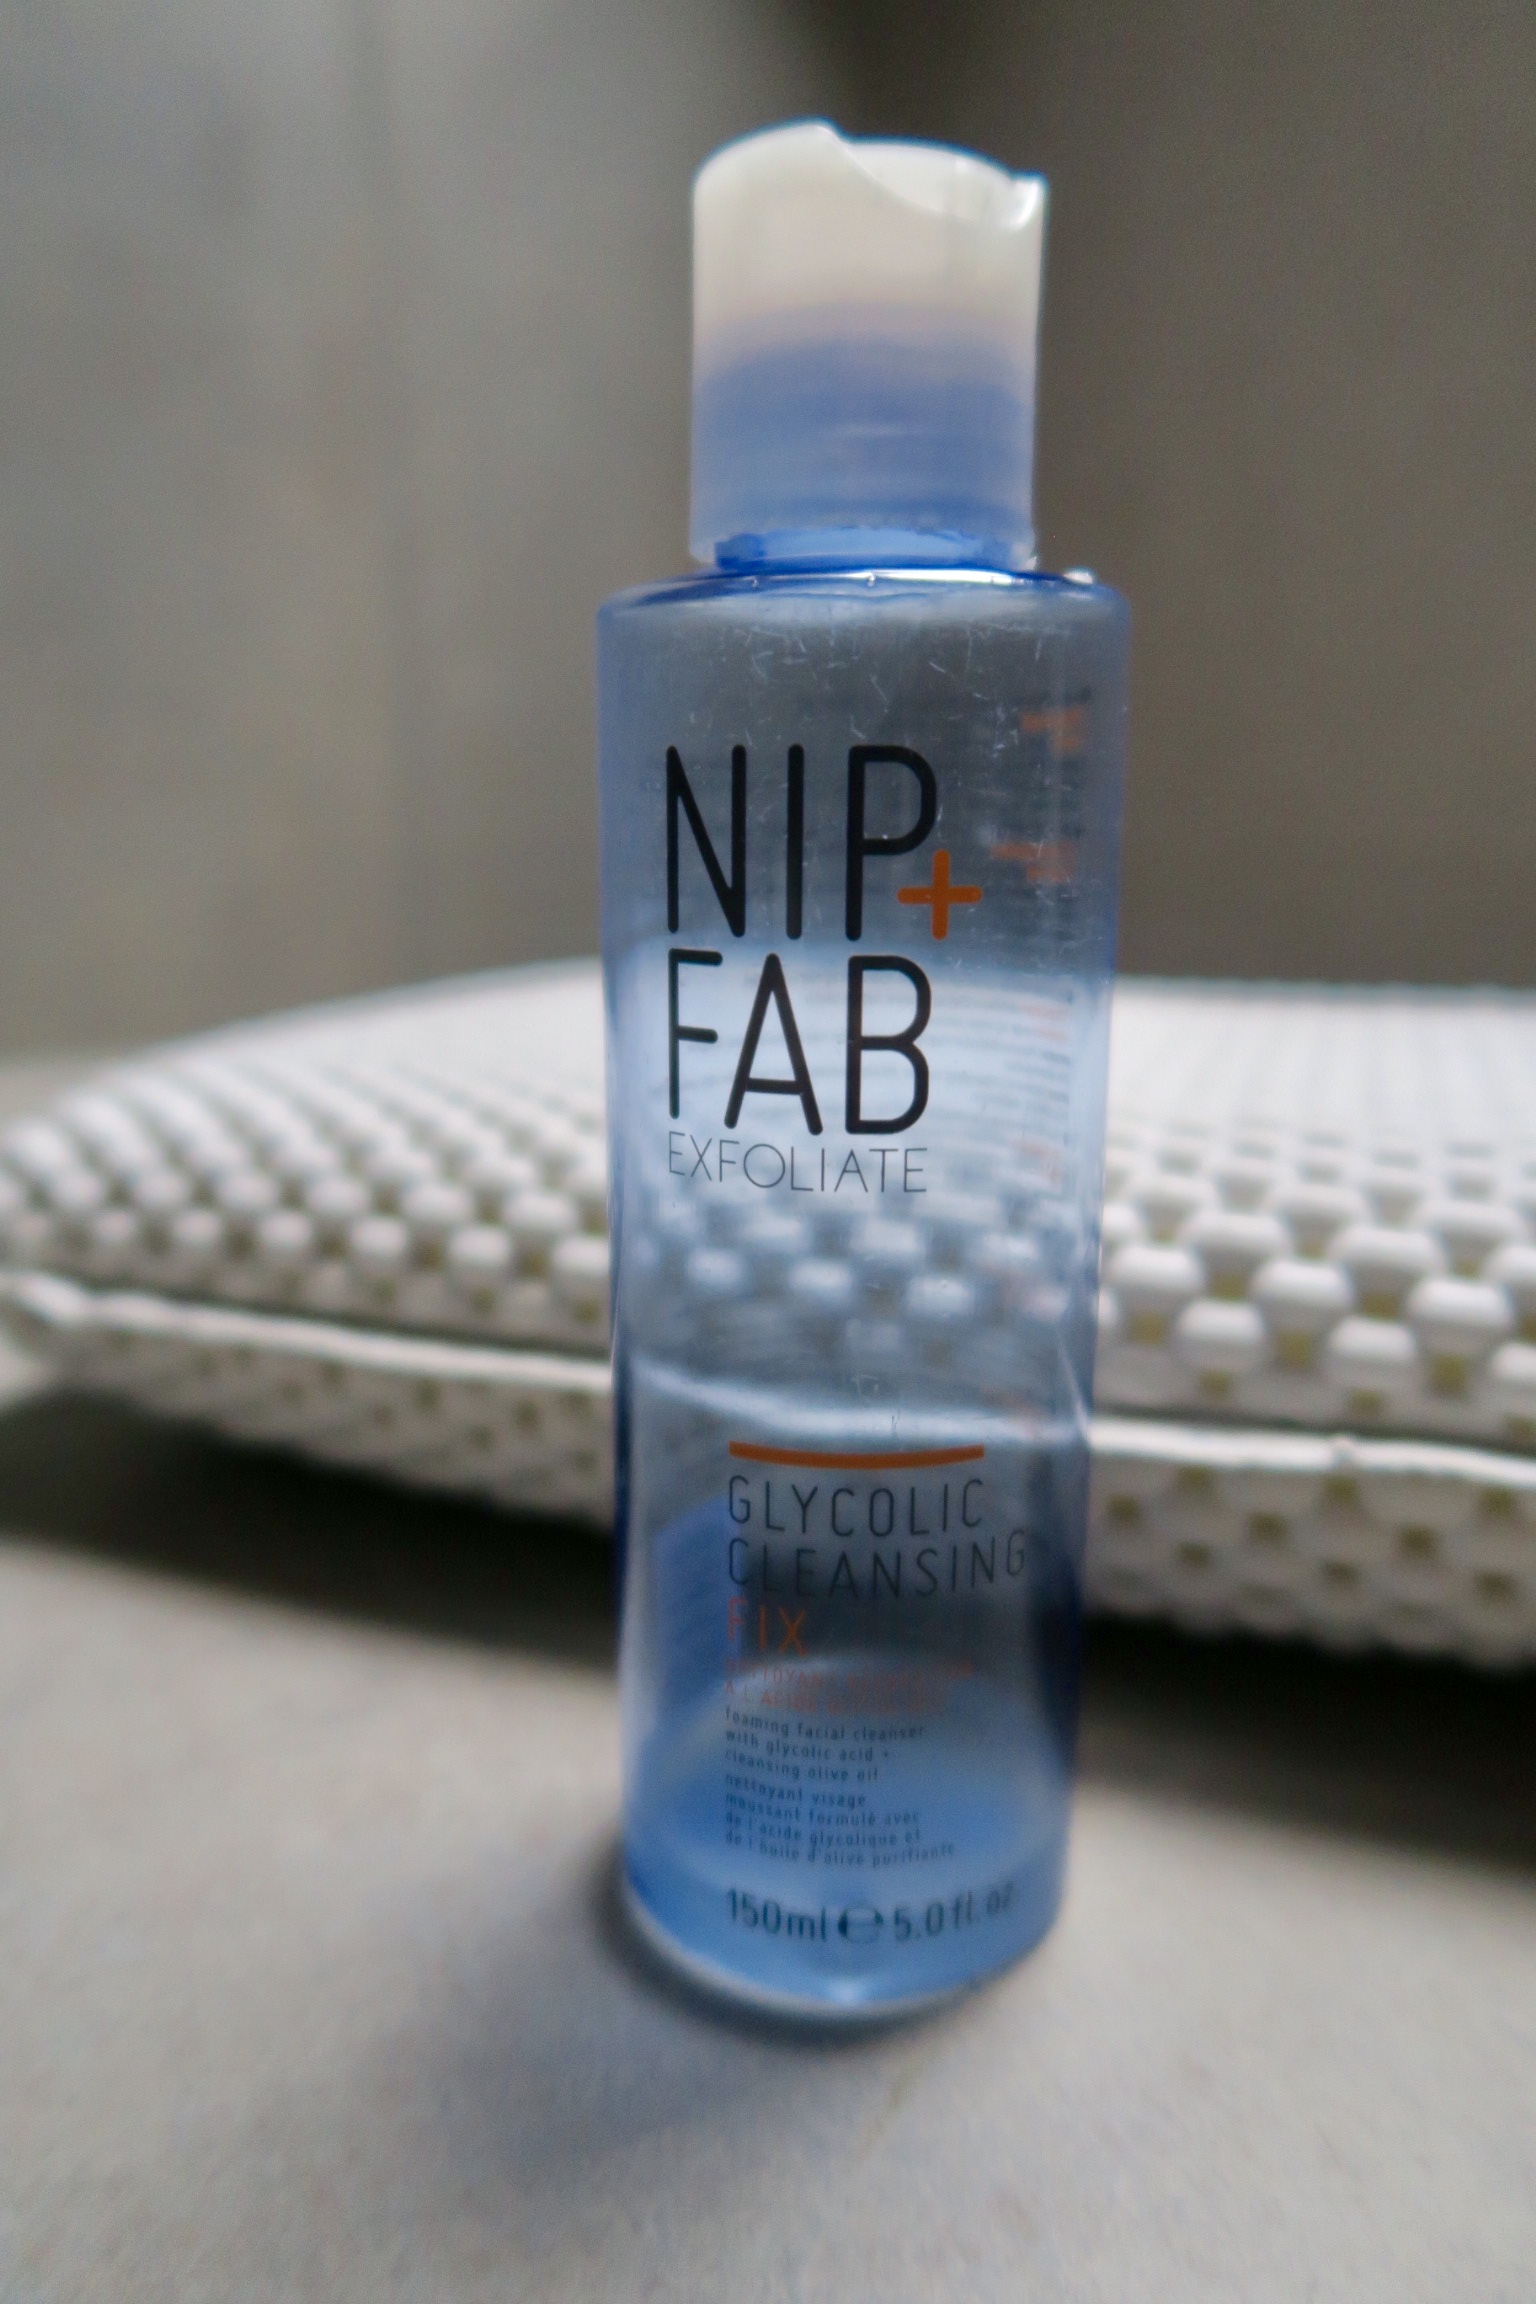 A near empty (I use it a lot) Nip + Fab Glycolic Cleansing Fix, £7.95 at Boots.